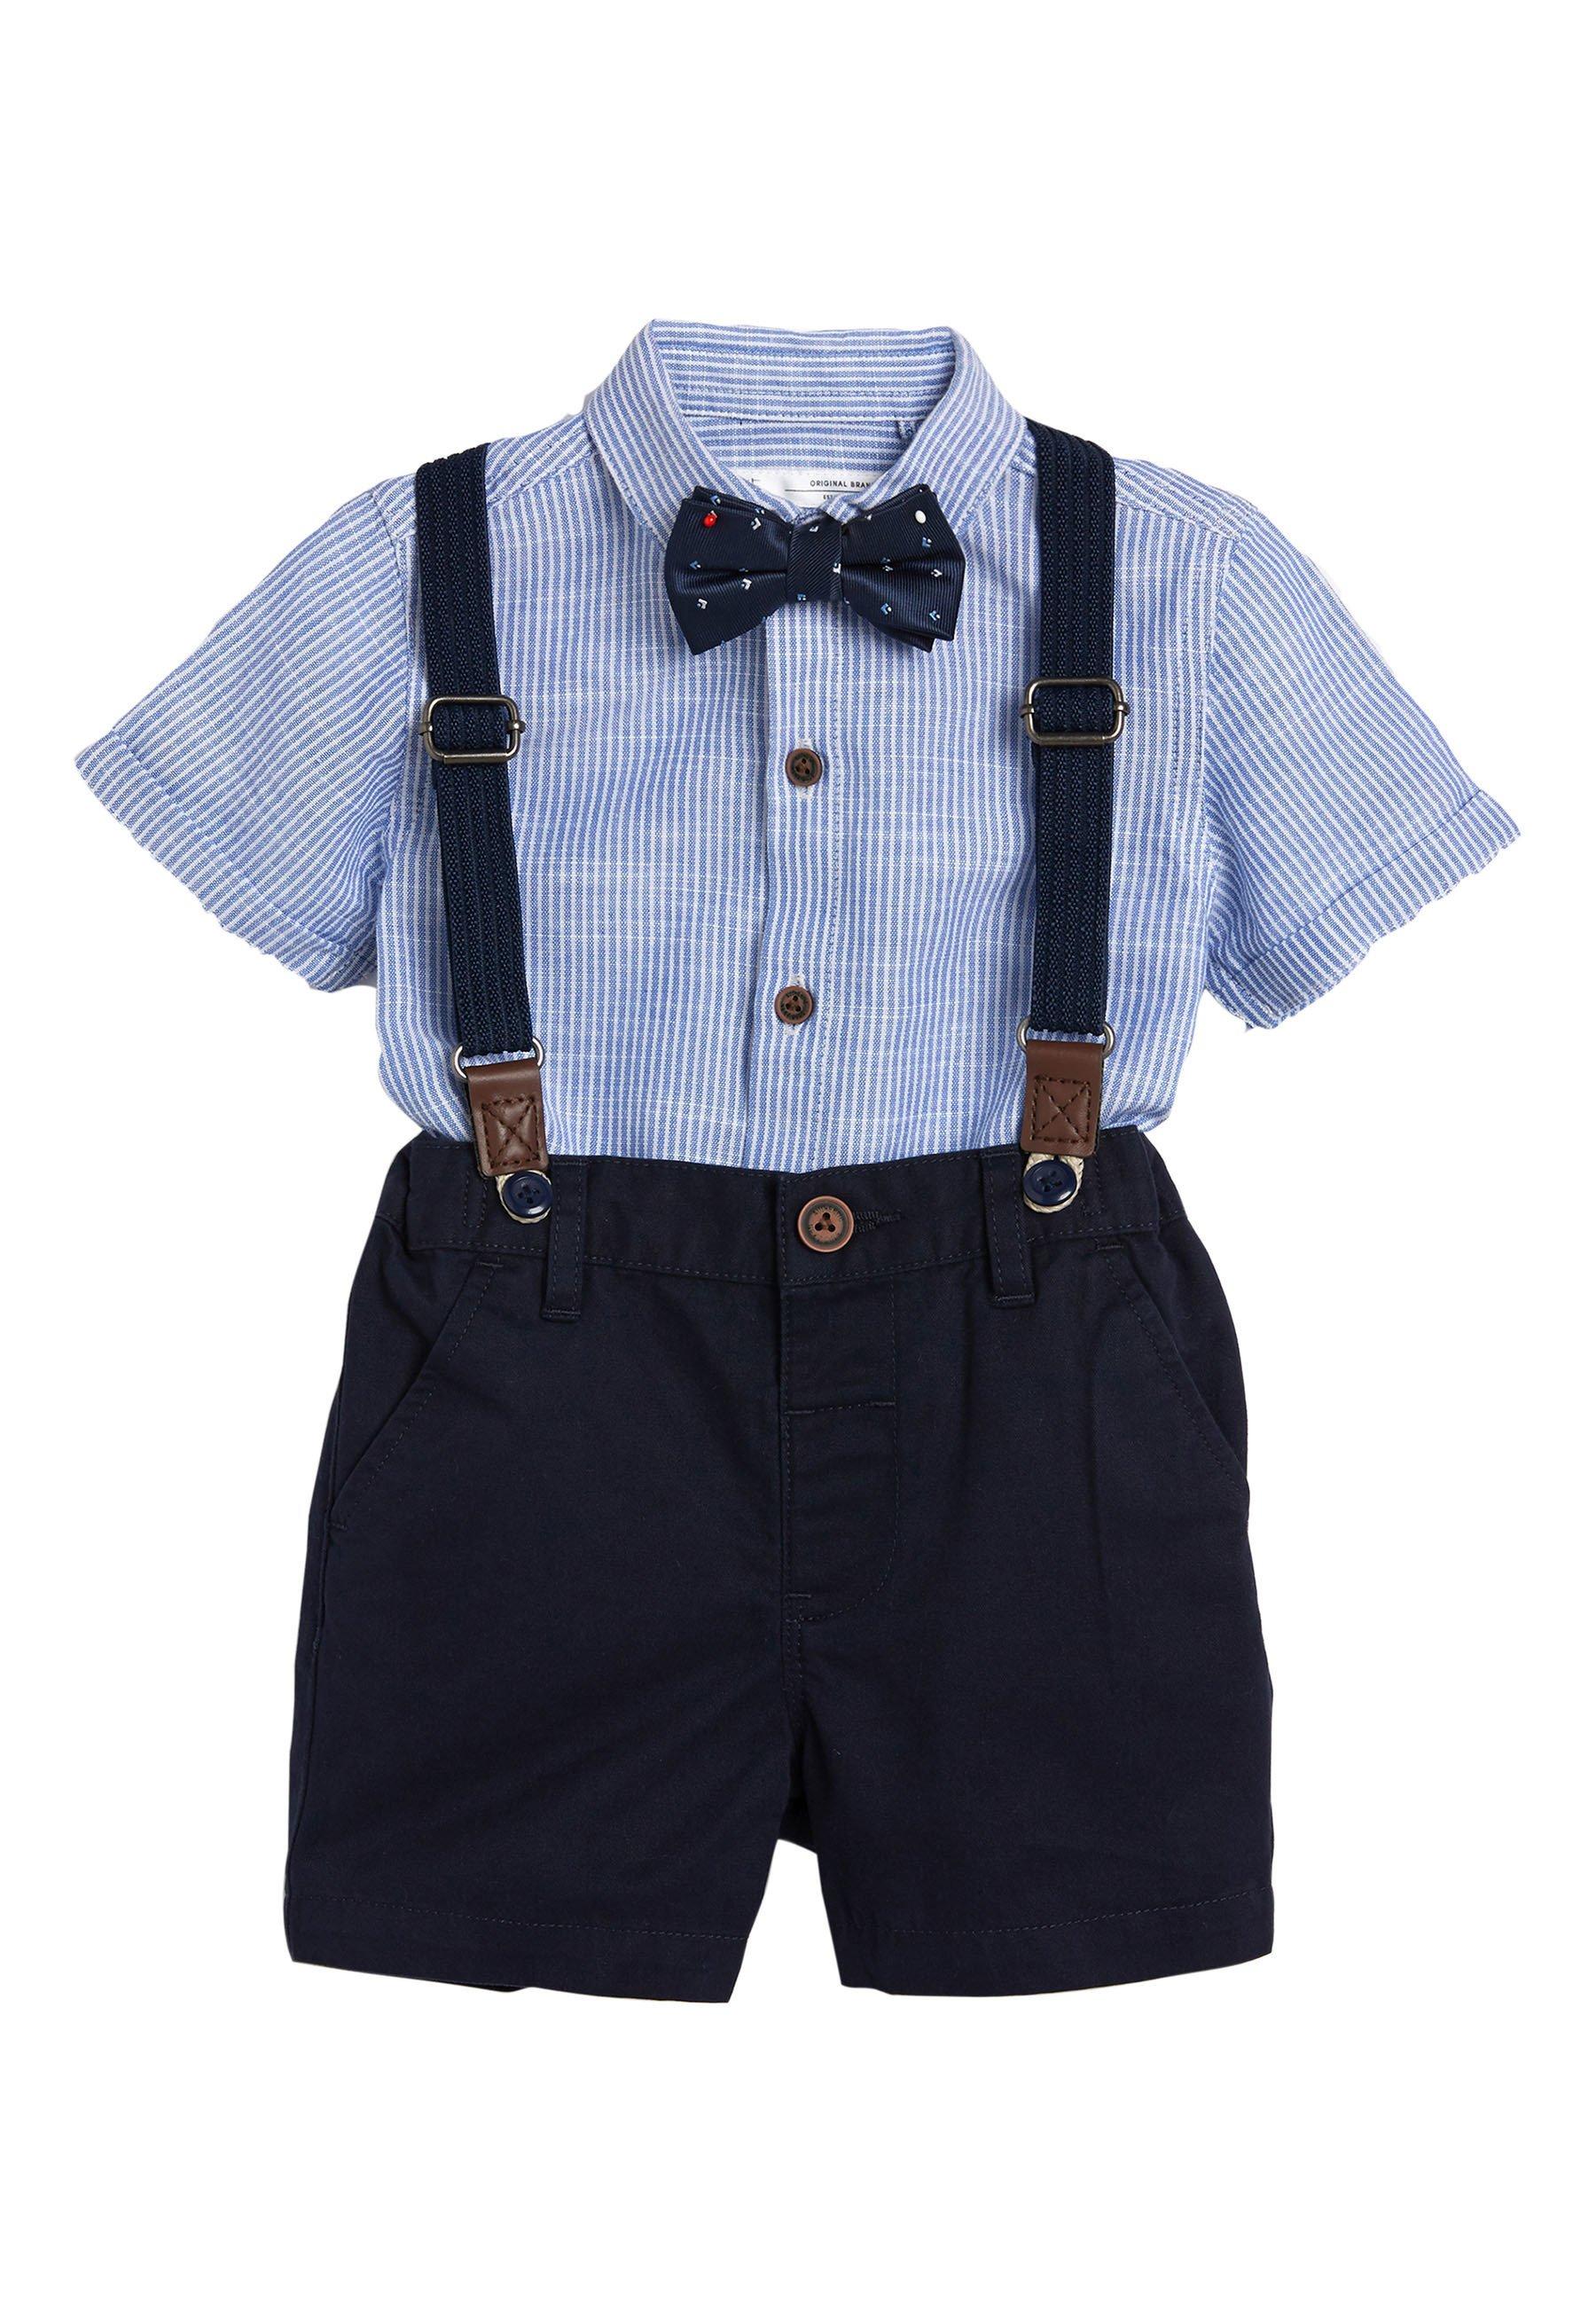 Kinder BLUE SHIRT, SHORTS, BOW TIE AND BRACES SET (3MTHS-7YRS) - Hemd